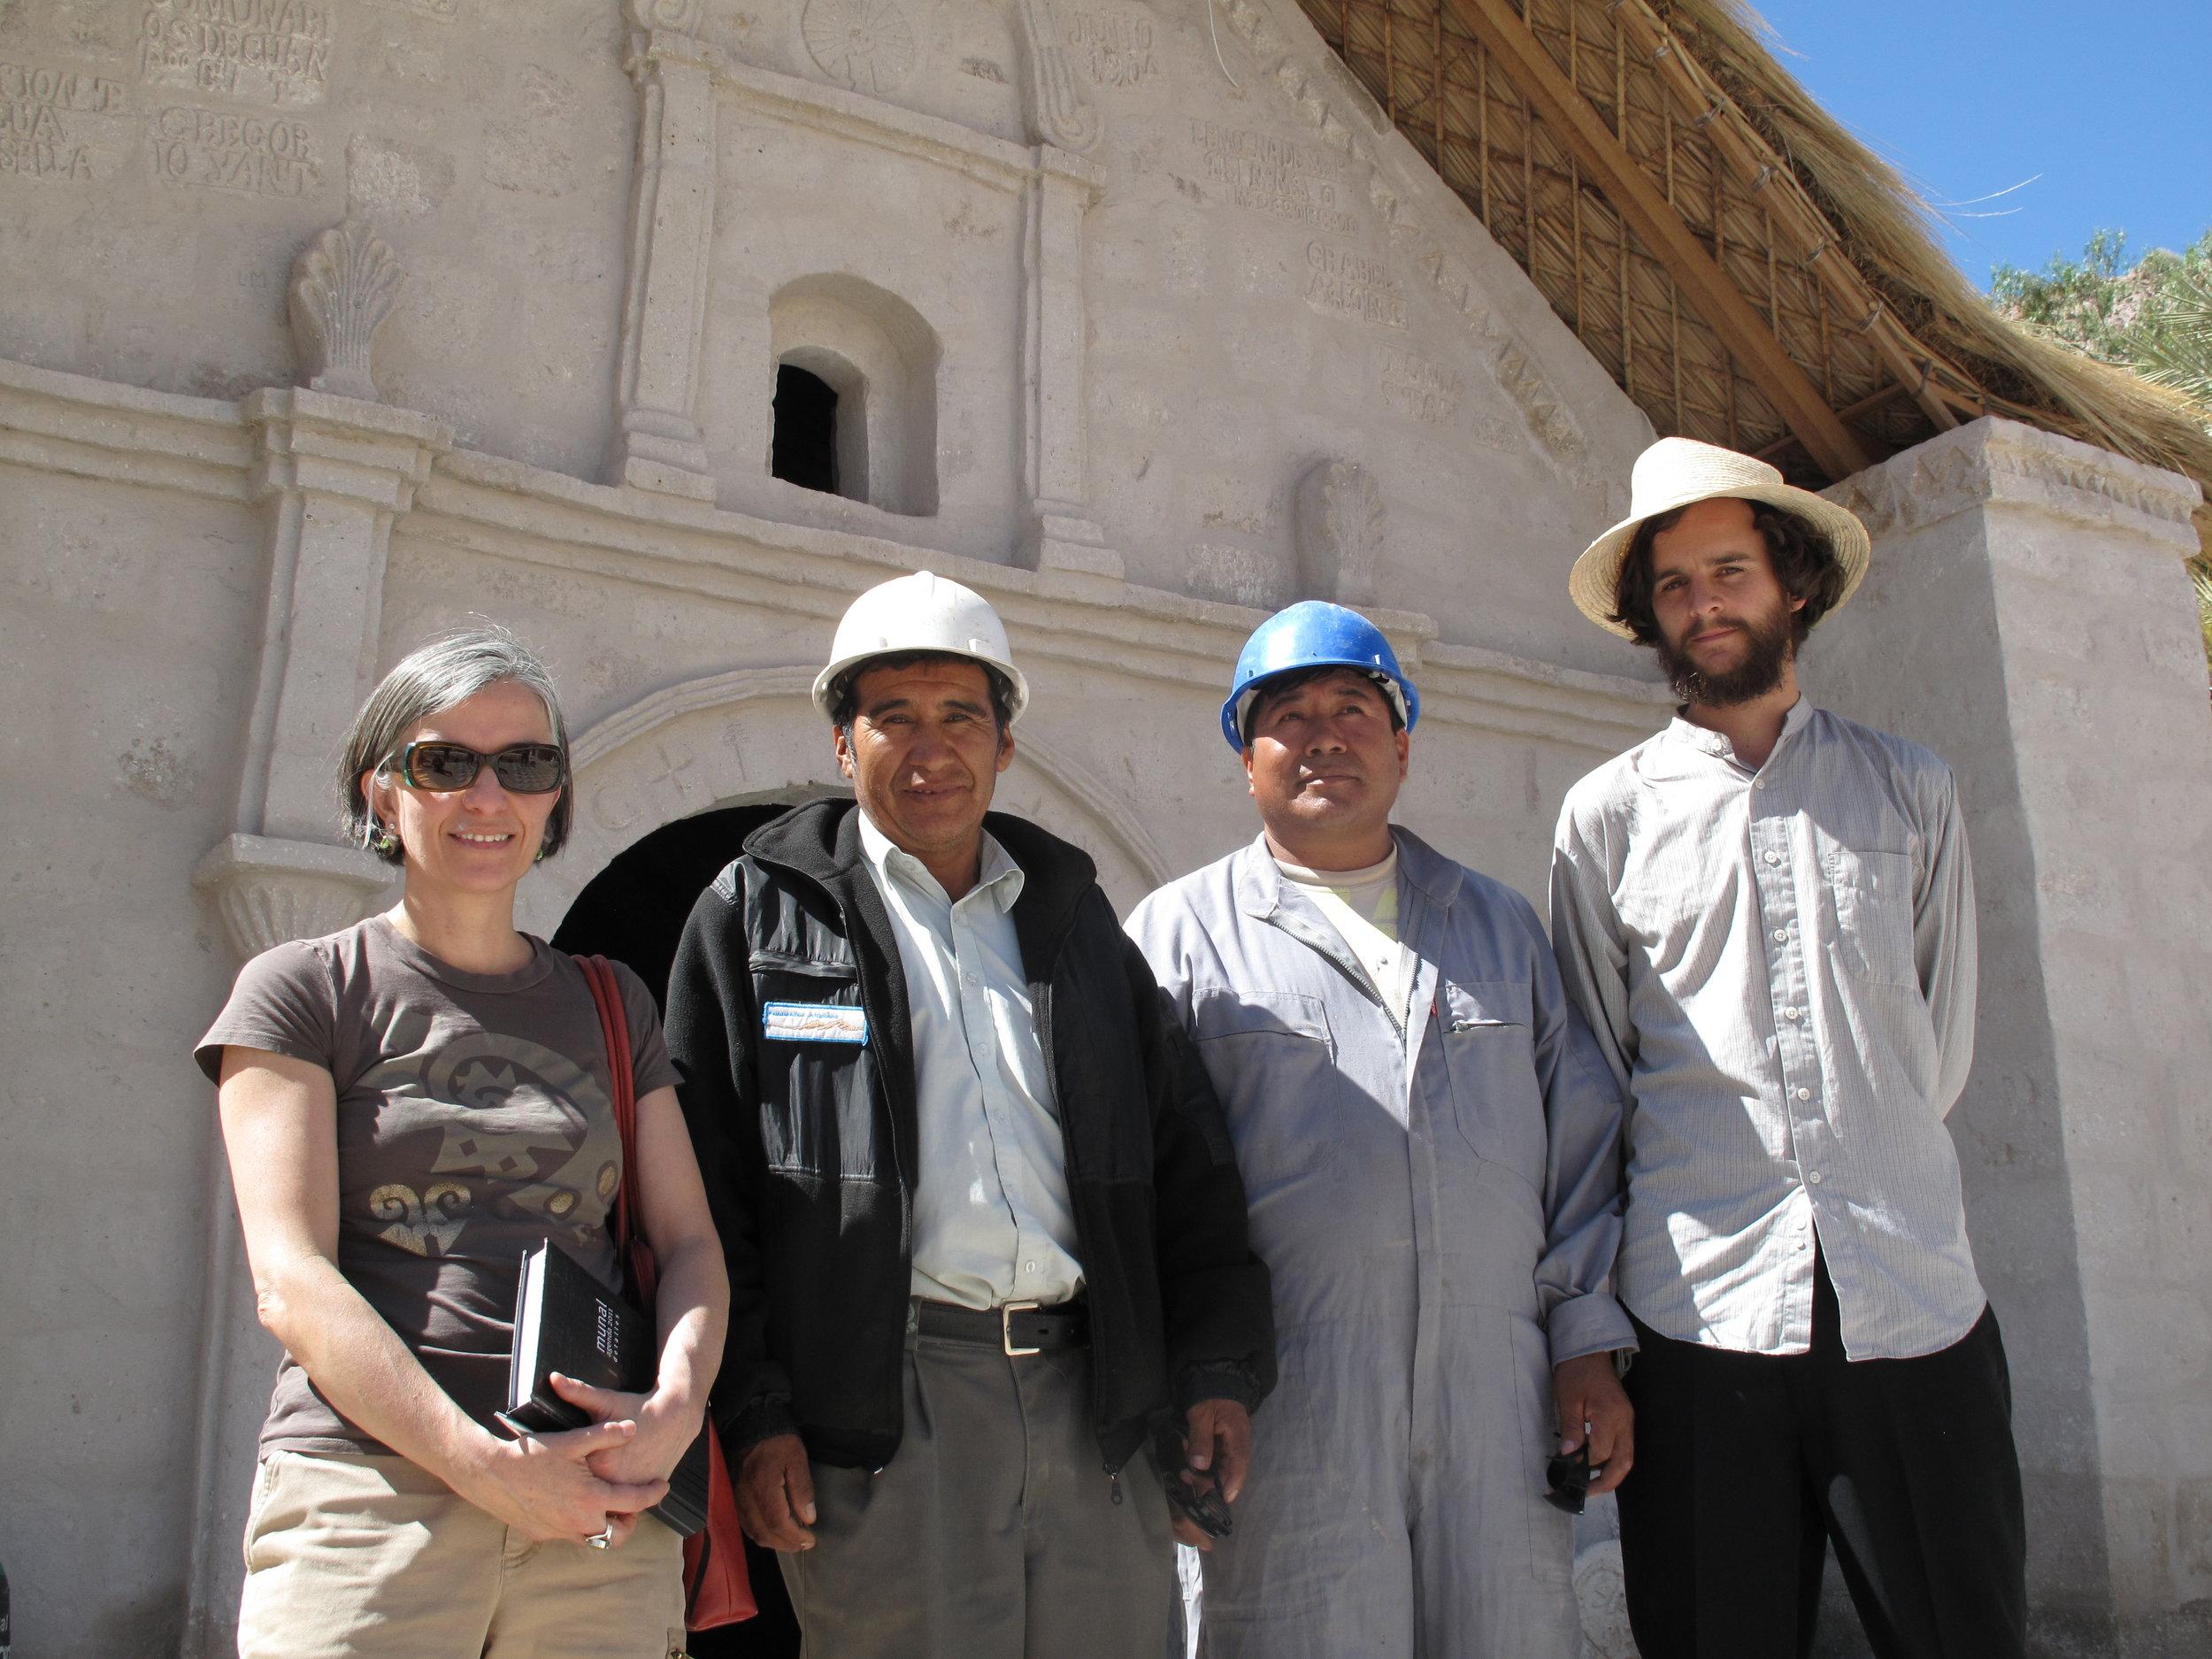 CHL_Arica Guanacagua Church team 2.JPG